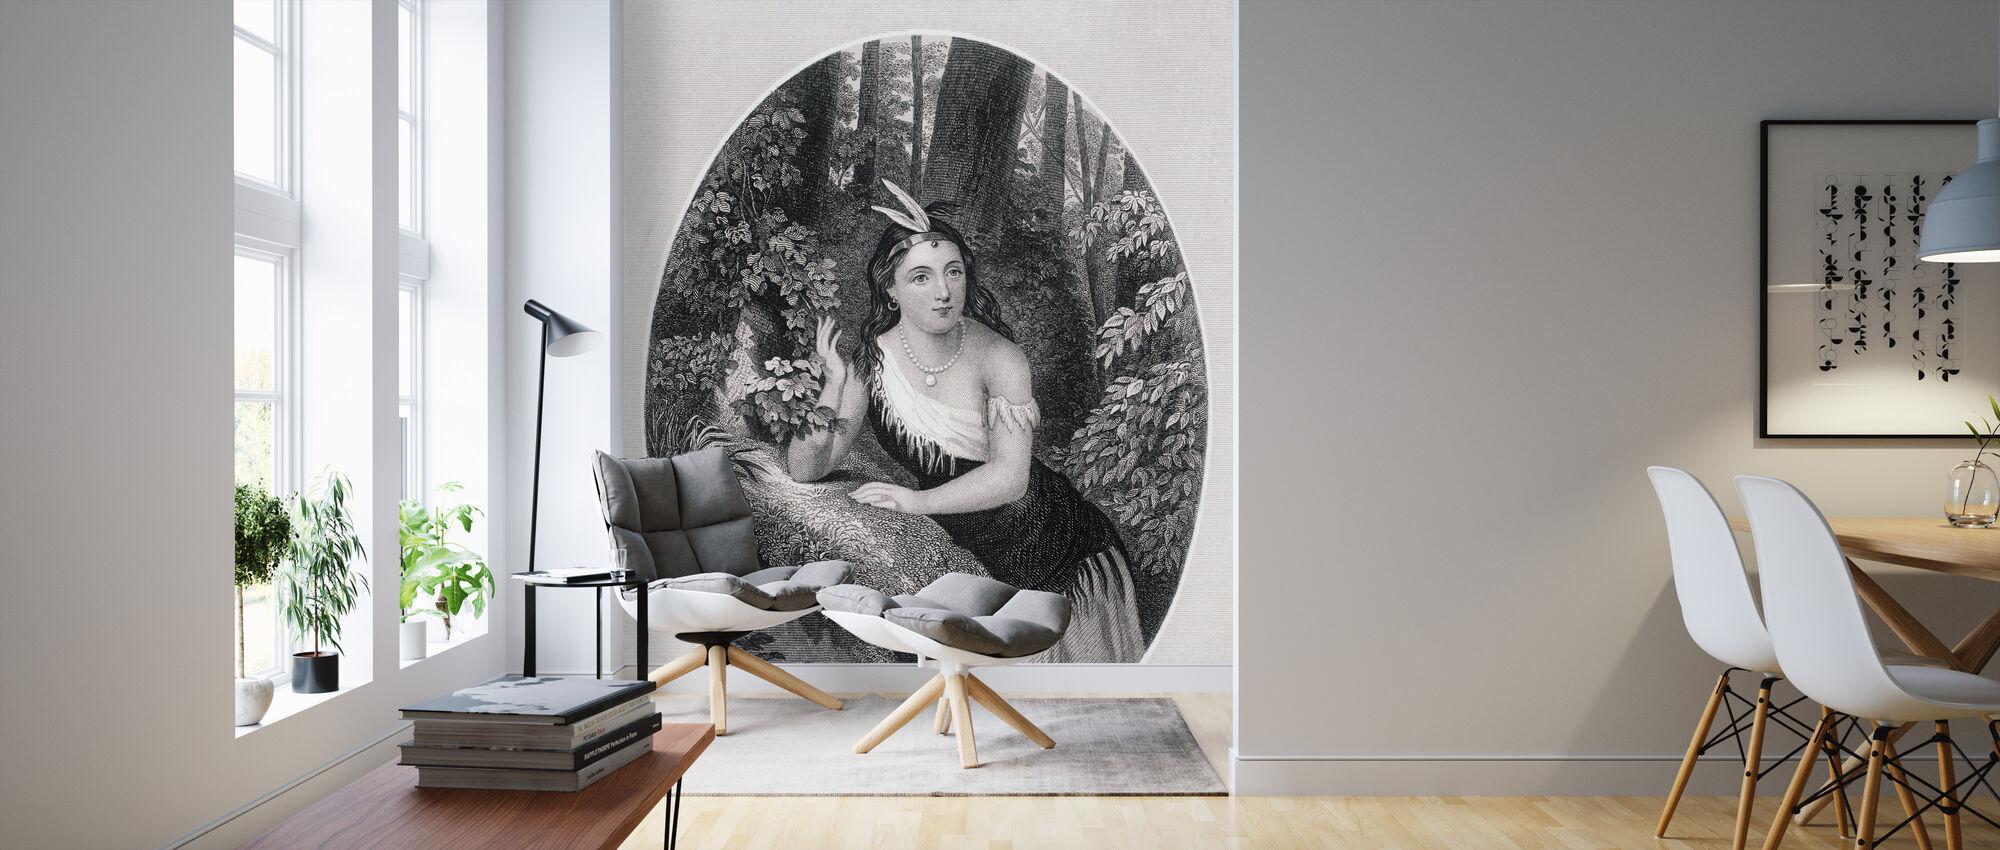 Pocahontas - Wallpaper - Living Room